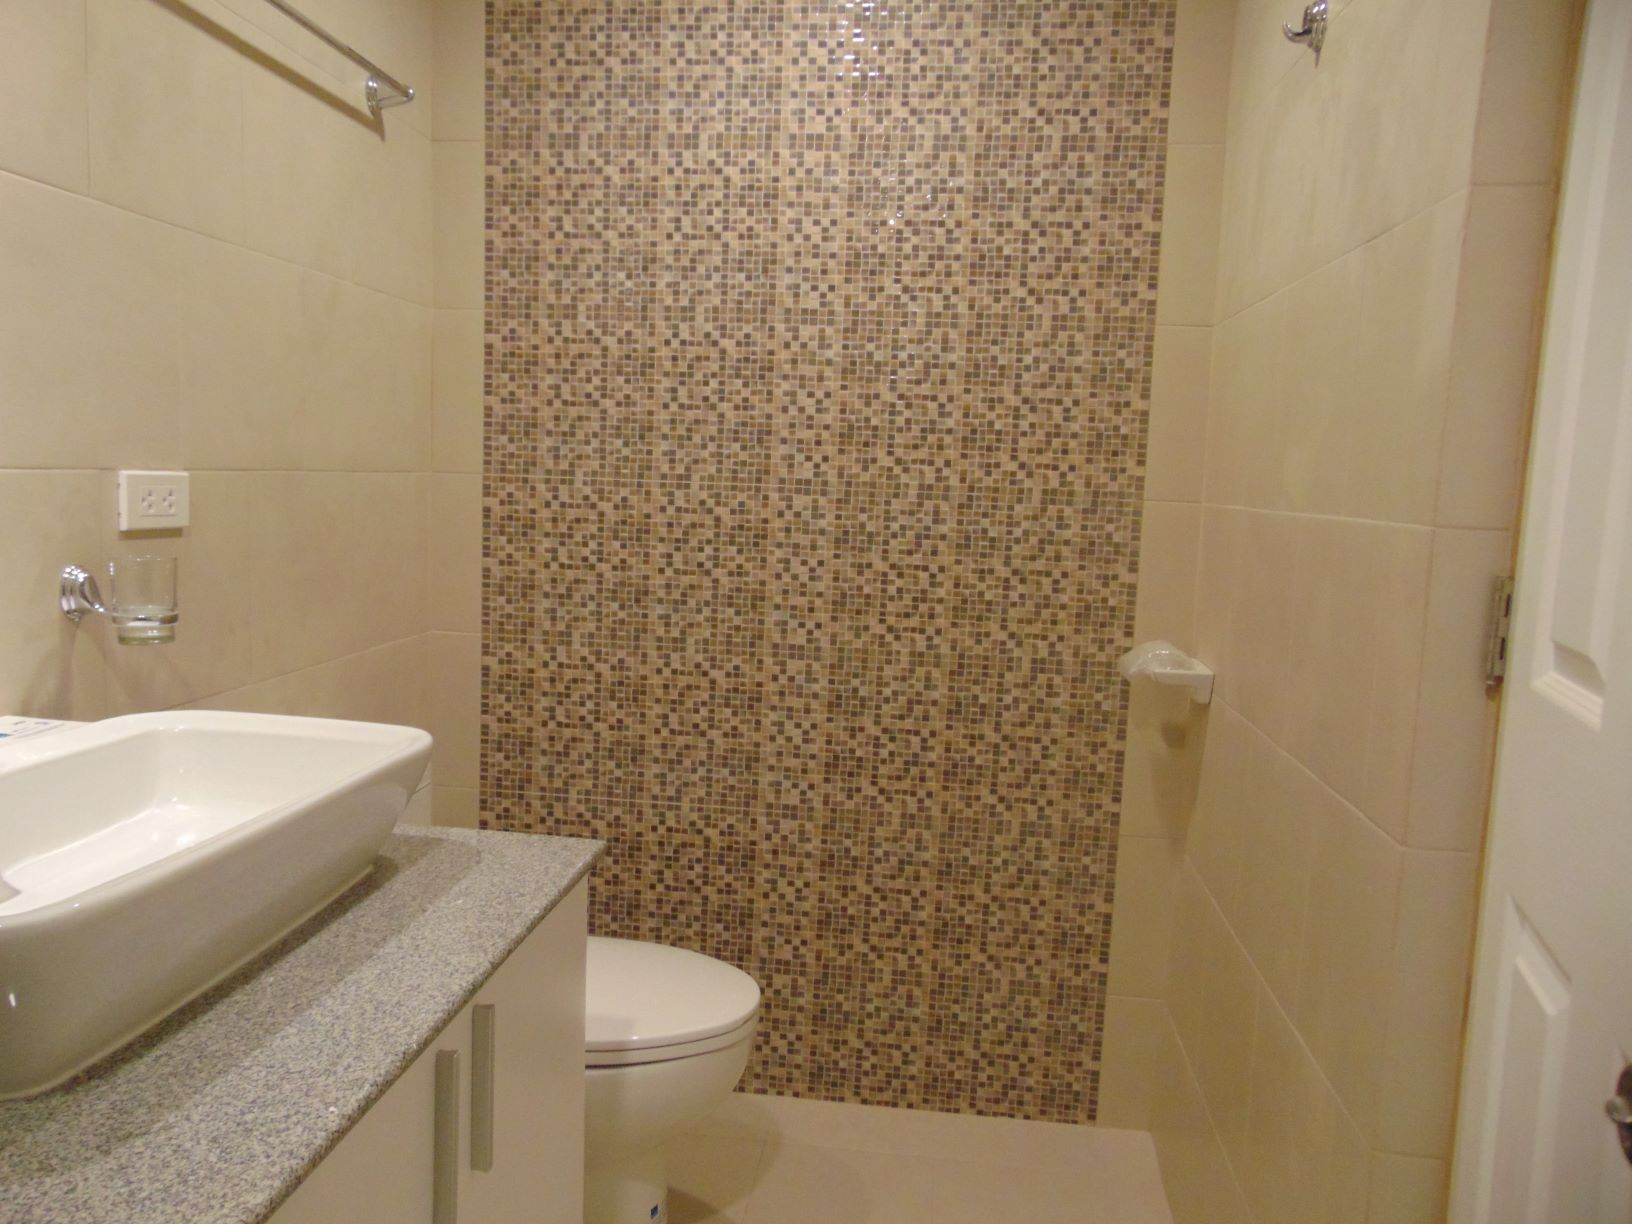 5-bedroom-newly-built-house-in-punta-princesa-cebu-city-with-4-suv-car-parking